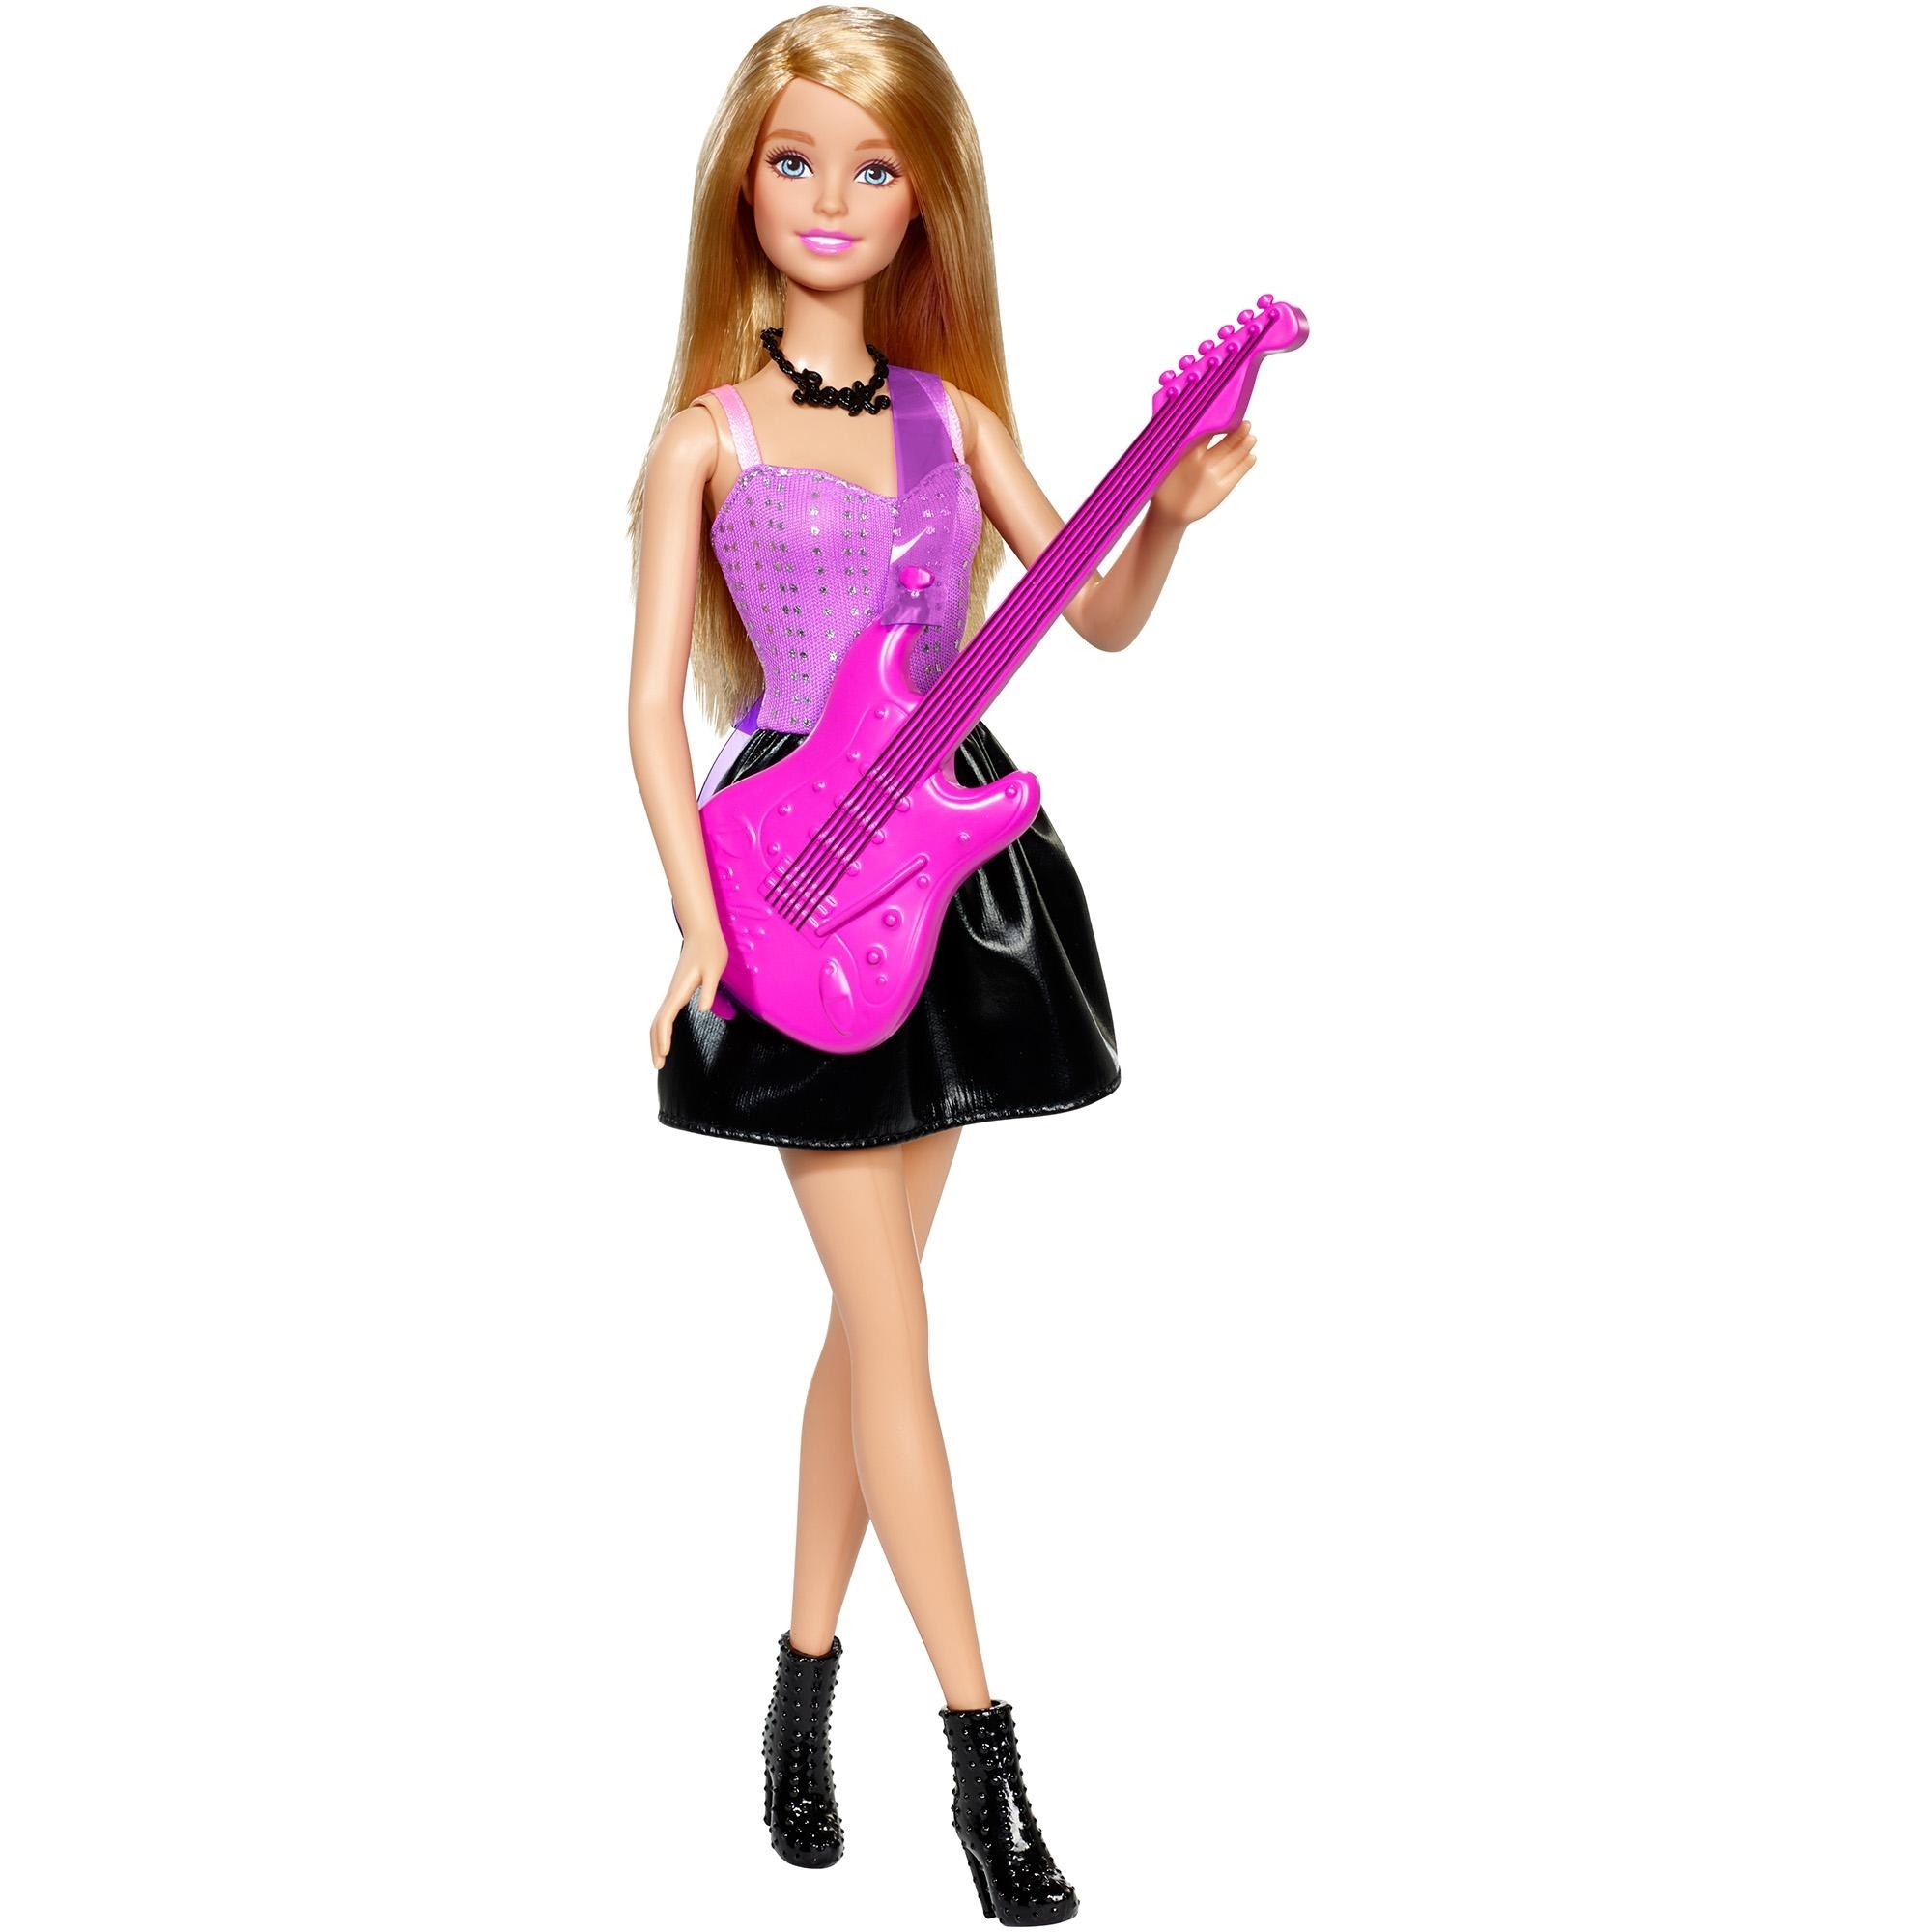 Barbie Wallpaper 2018